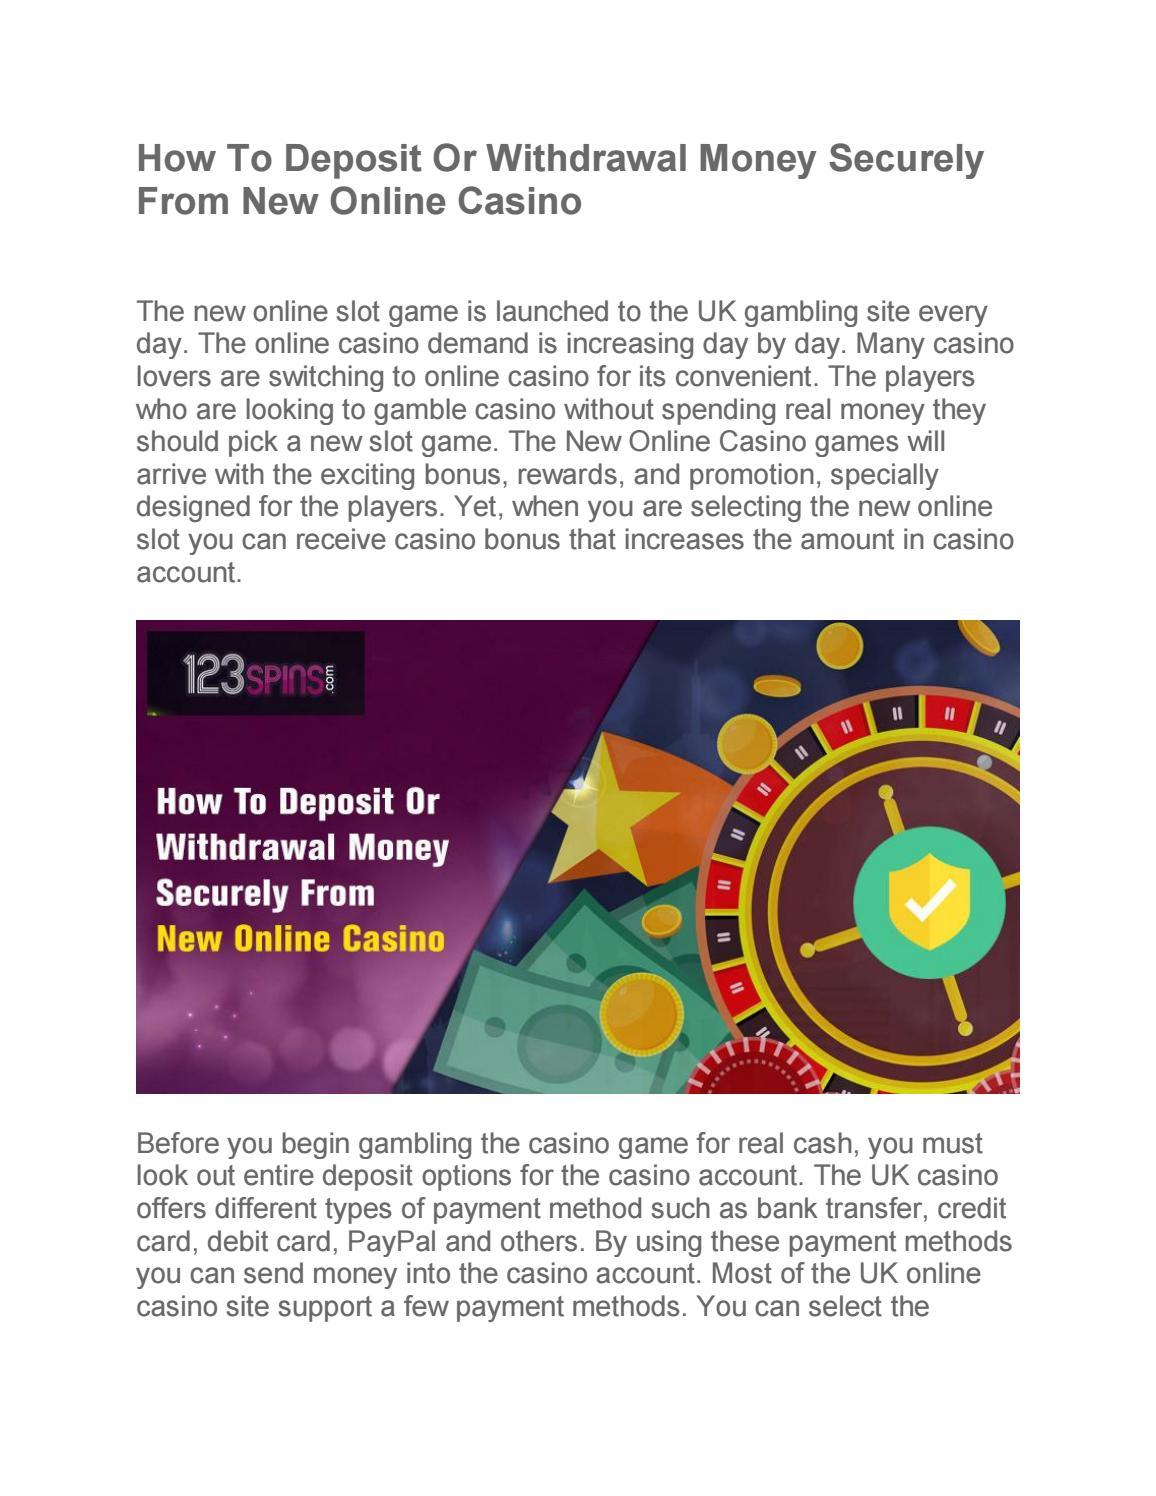 New online casino offers no deposit